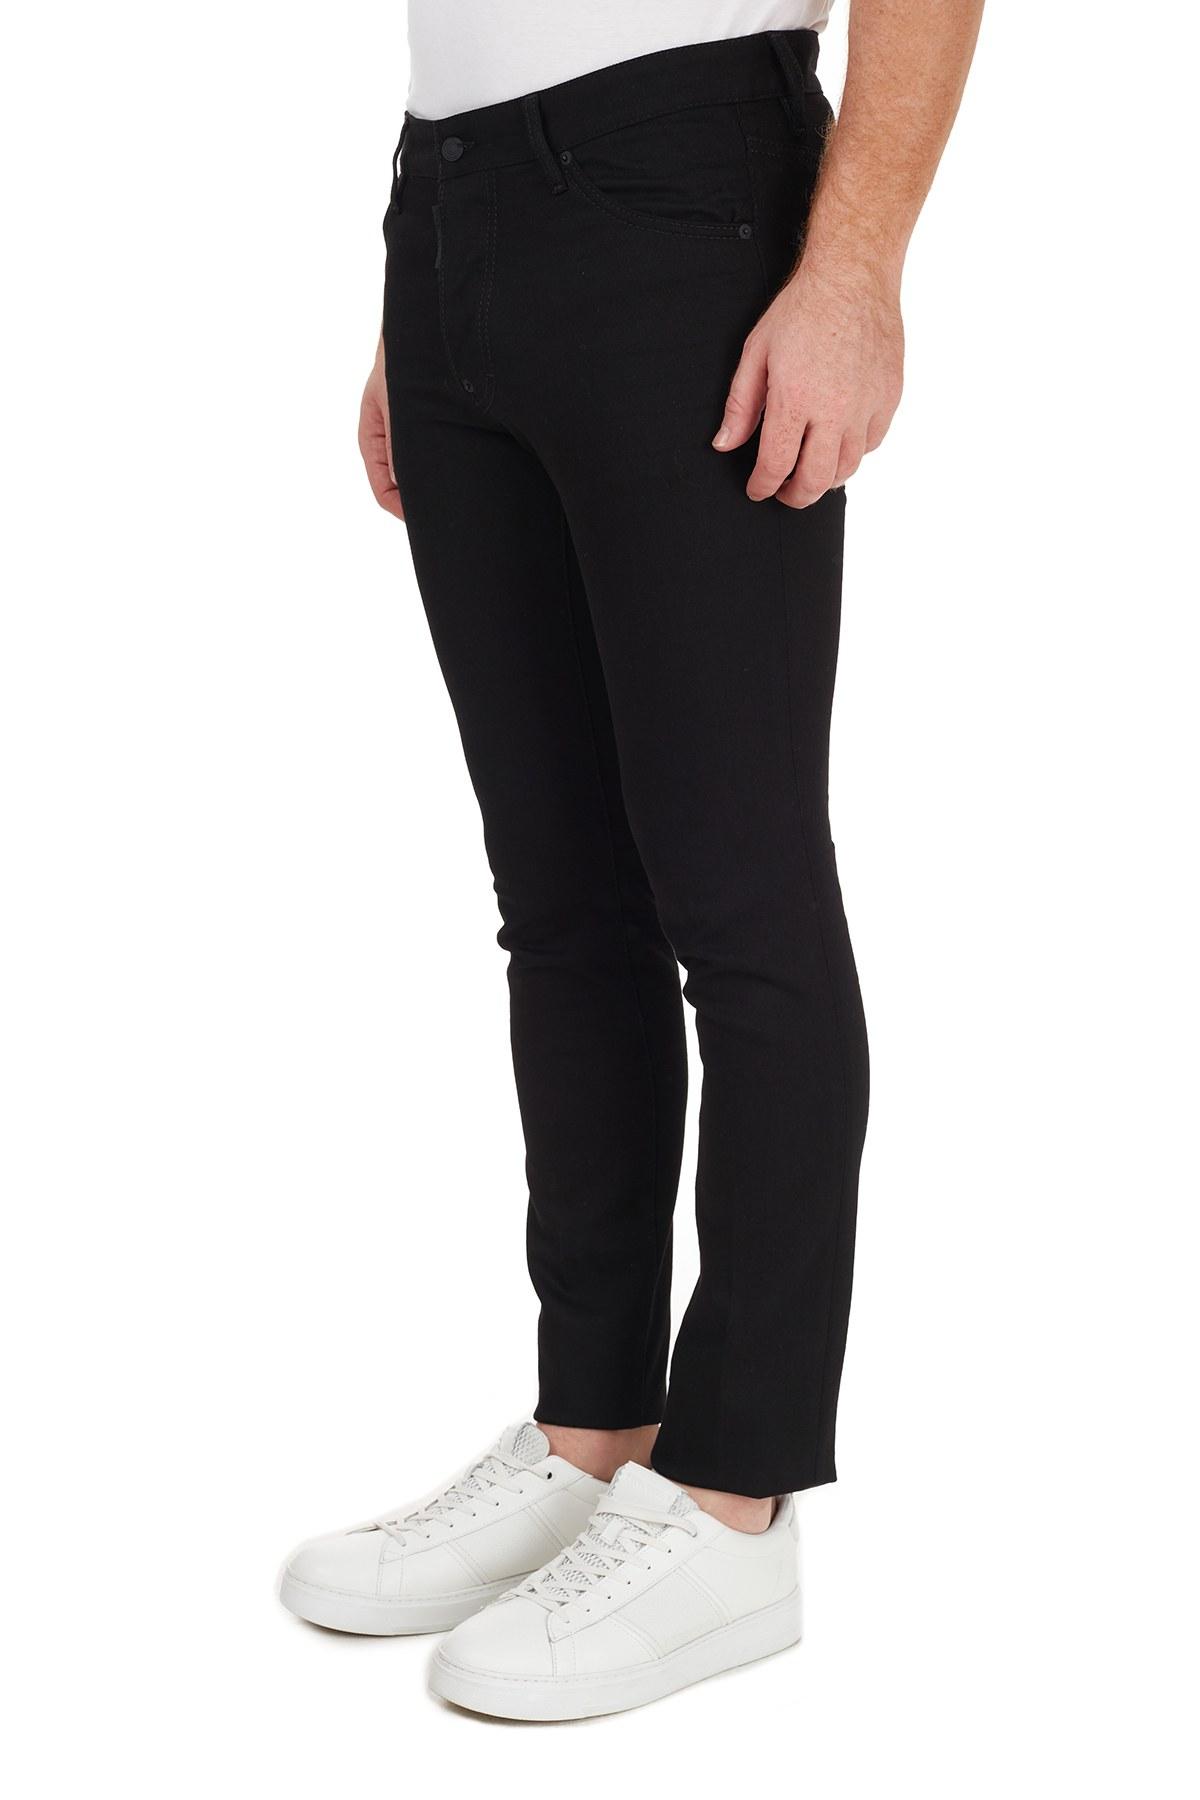 Dsquared2 Jeans Erkek Kot Pantolon S74LB0779 S30564 900 SİYAH